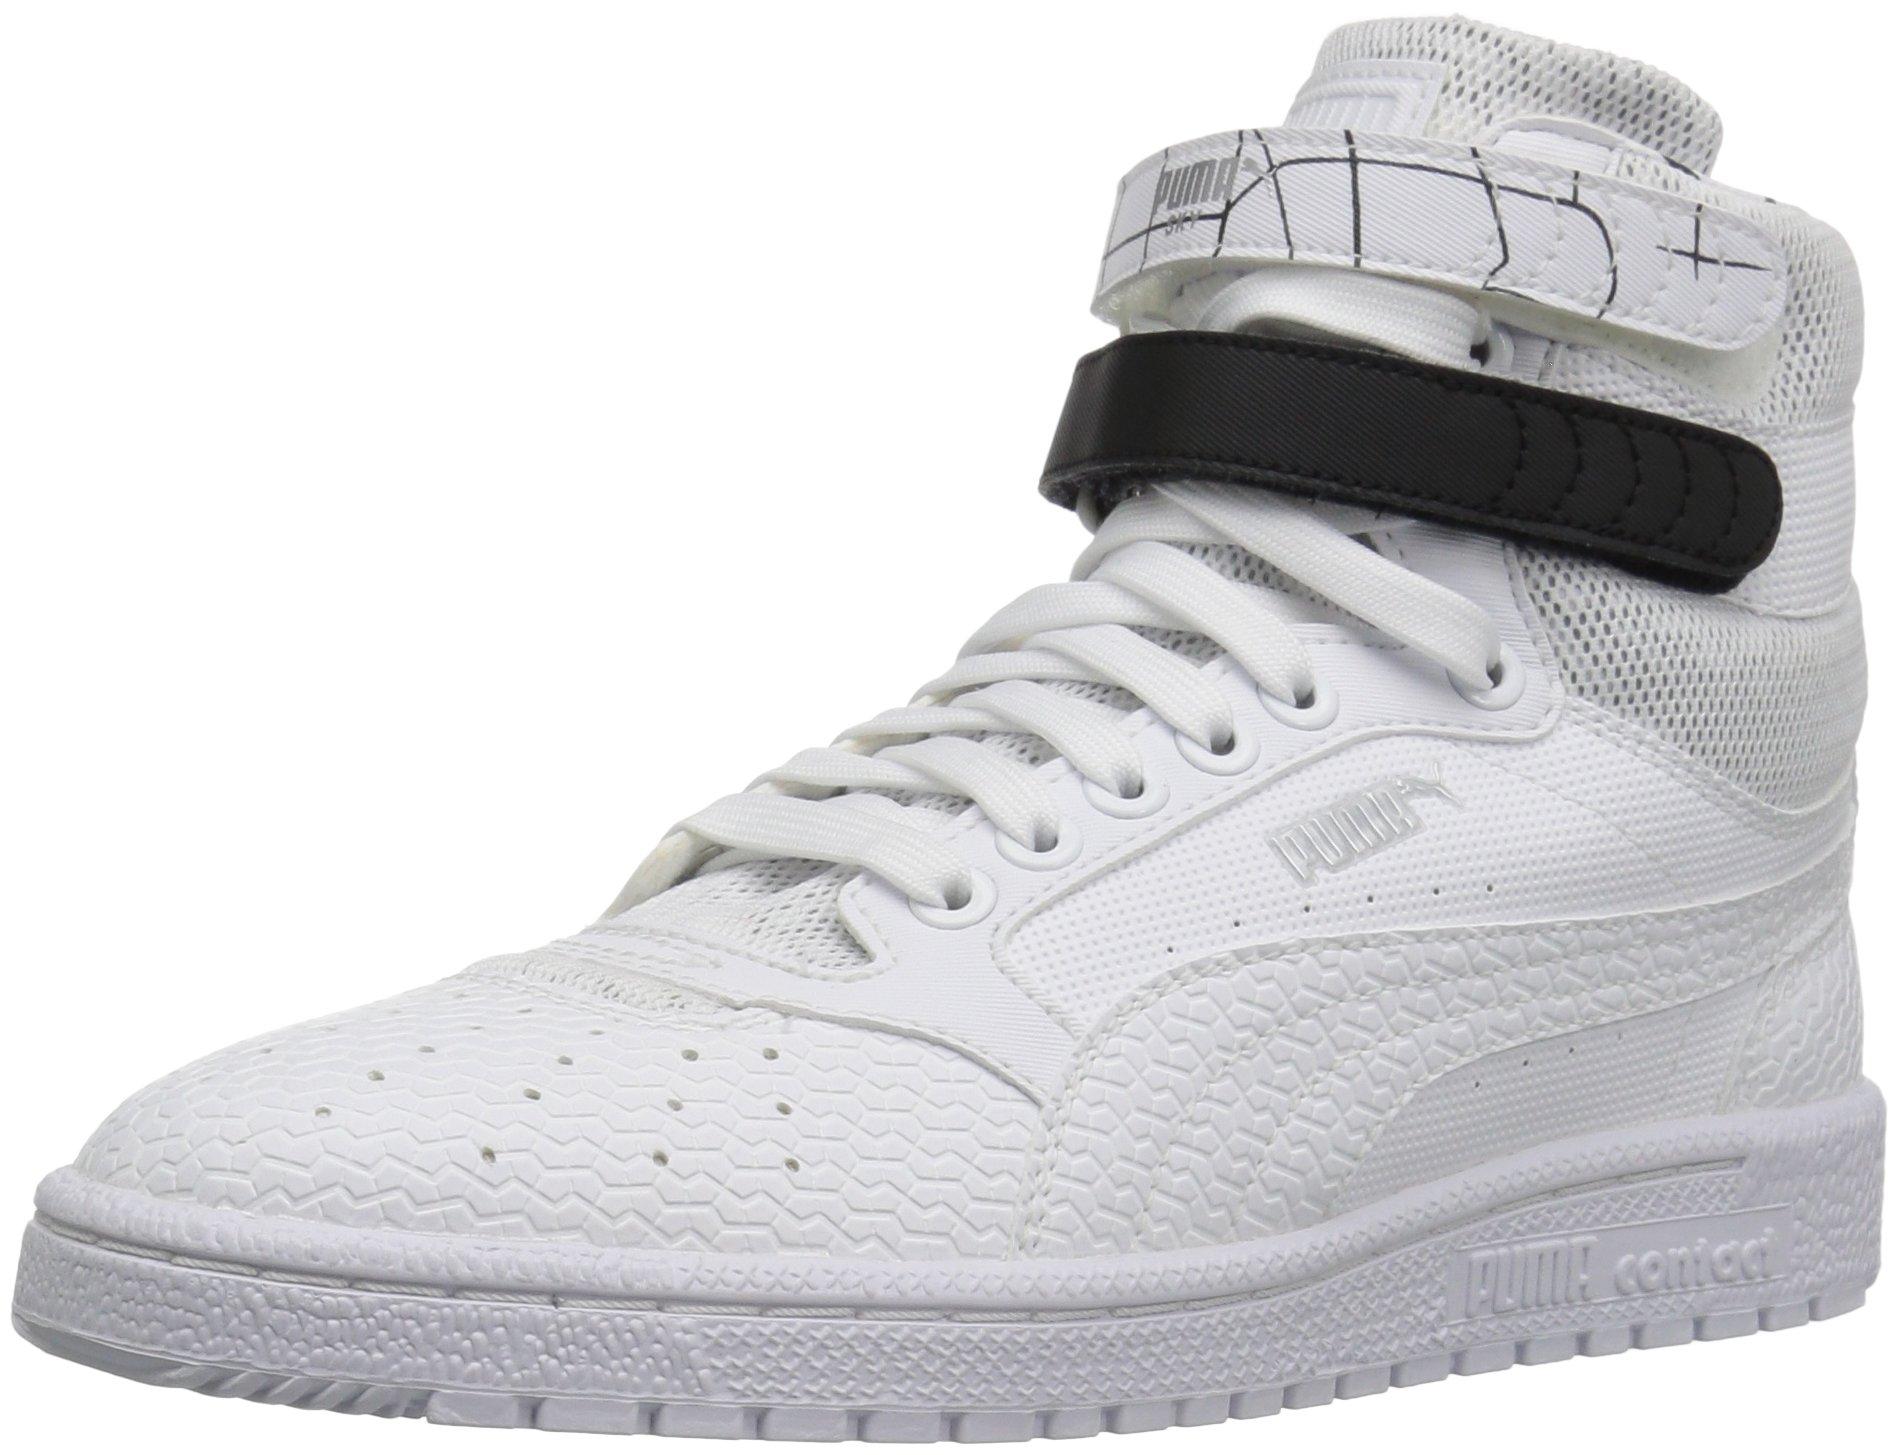 PUMA Women's Sky ii hi sf Texture WN's Basketball Shoe, White Black, 8.5 M US by PUMA